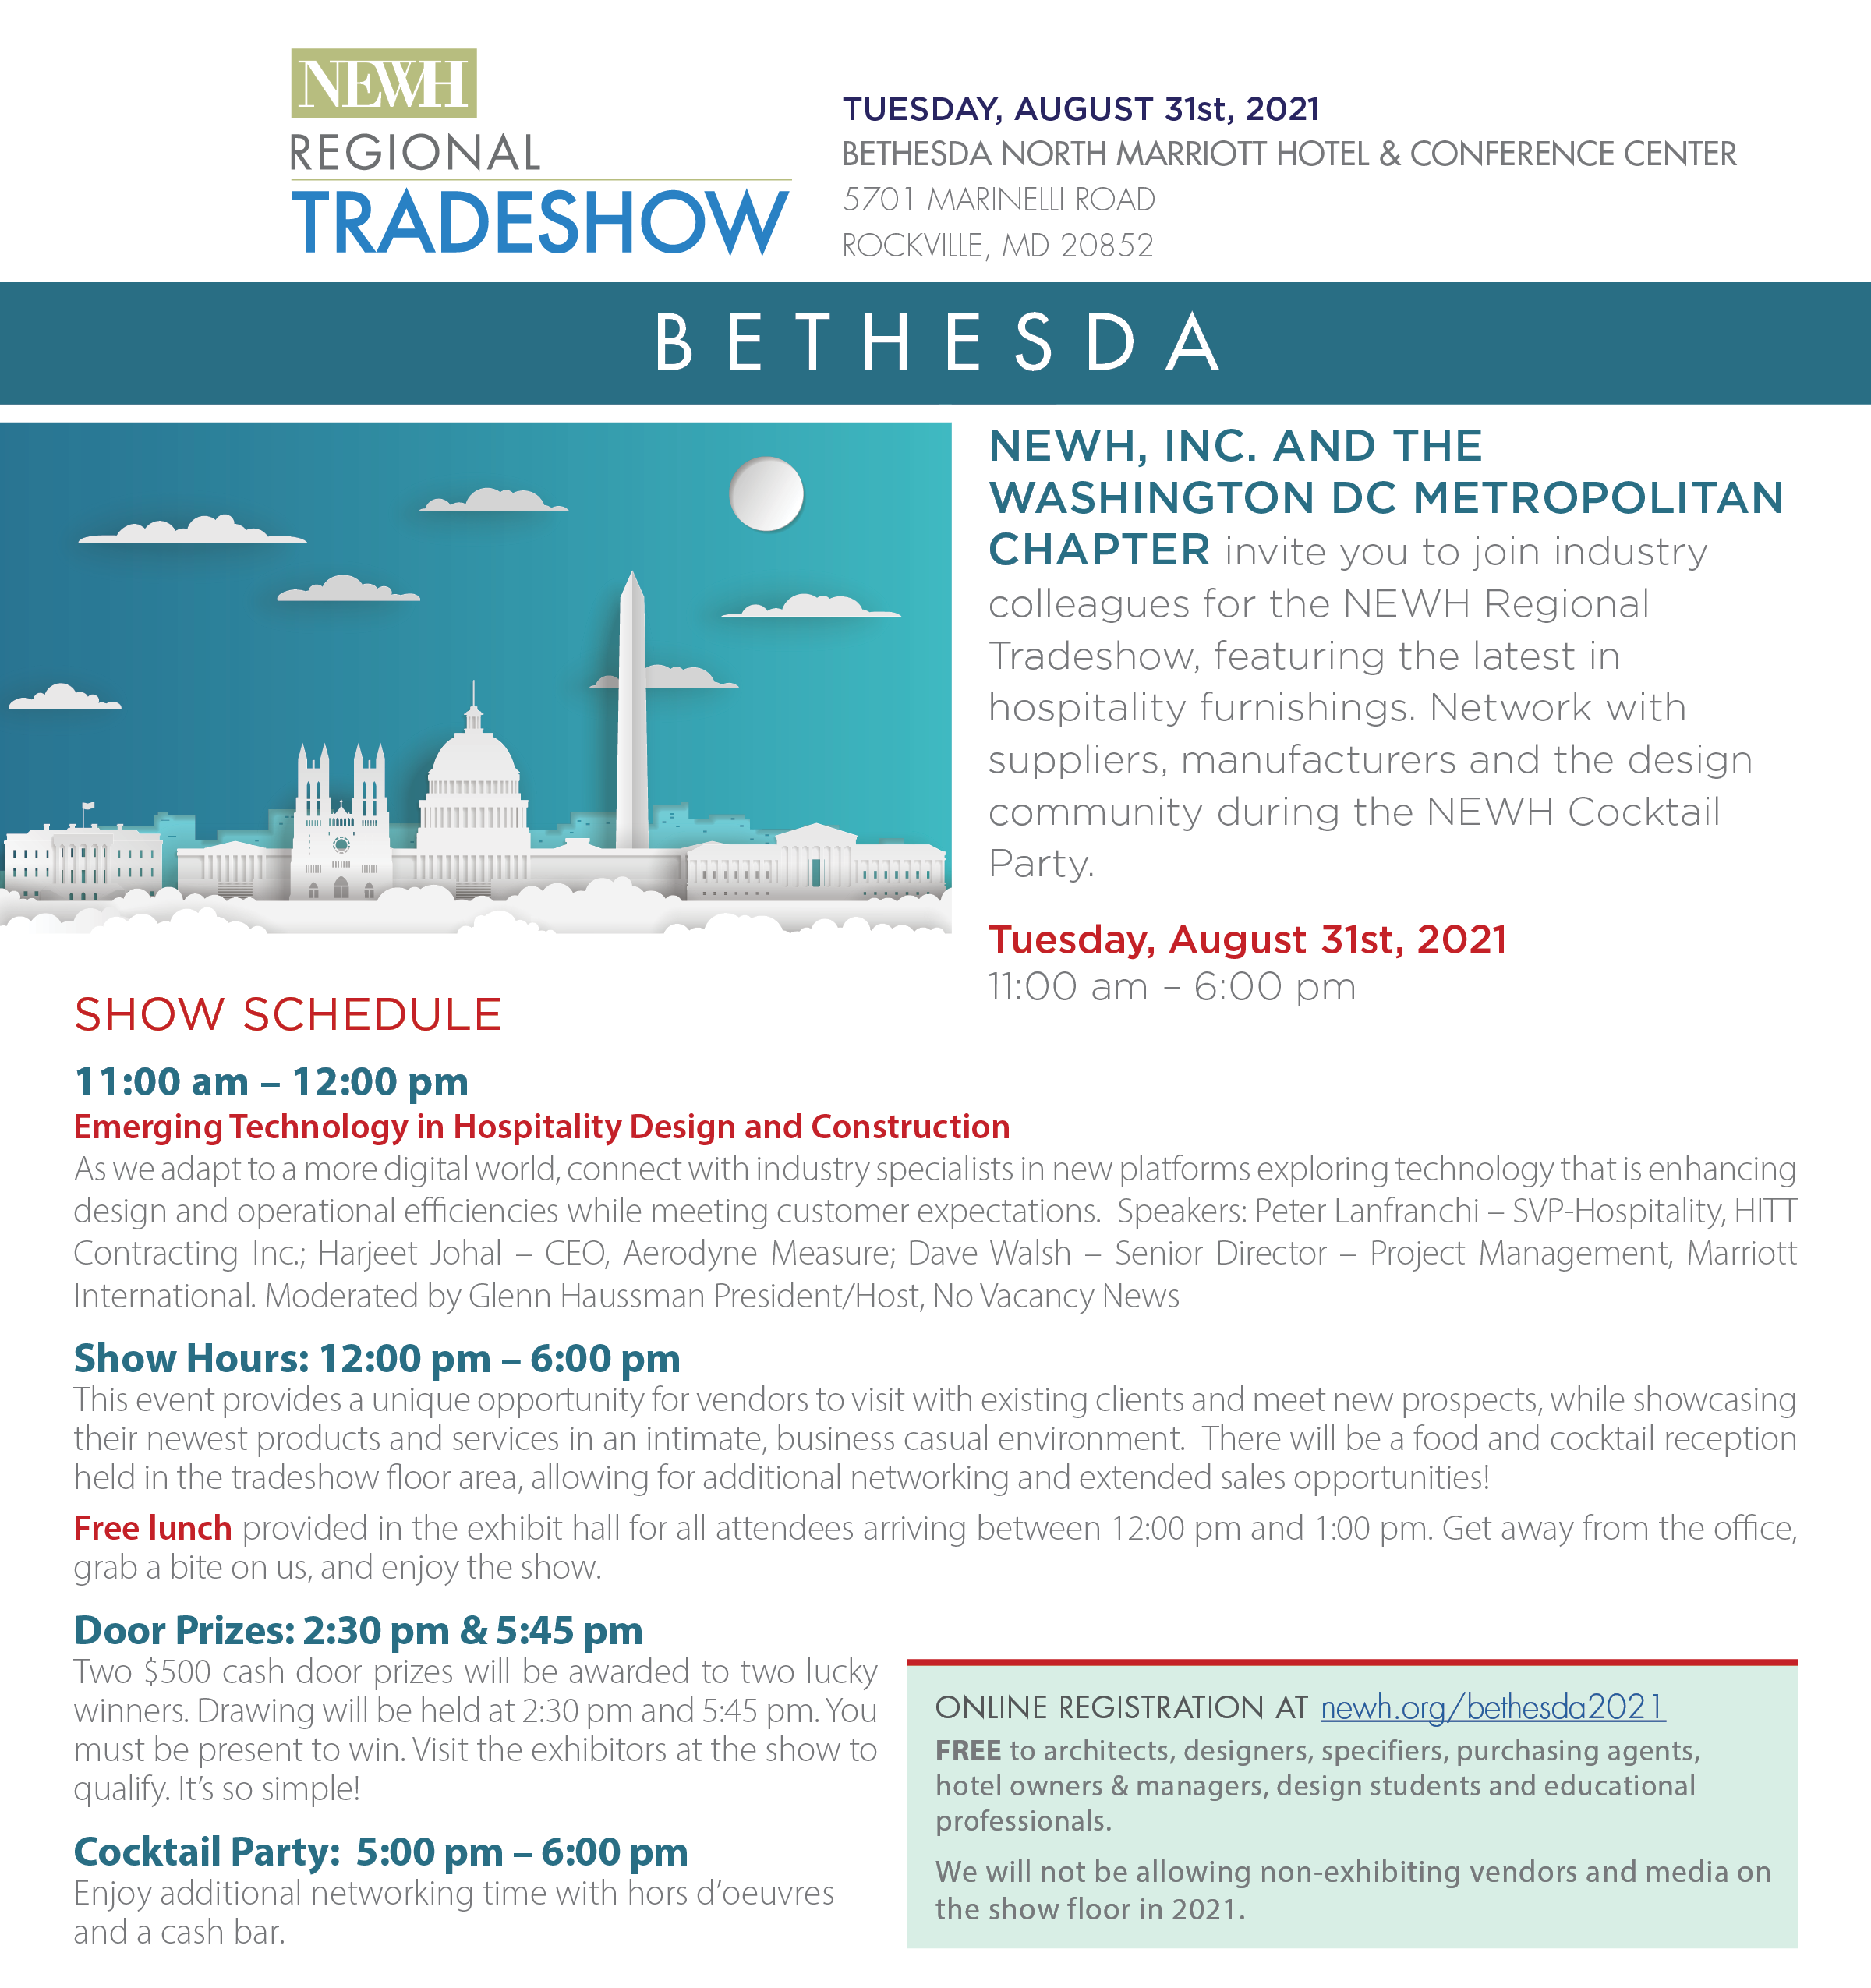 Bethesda Regional Tradeshow event information